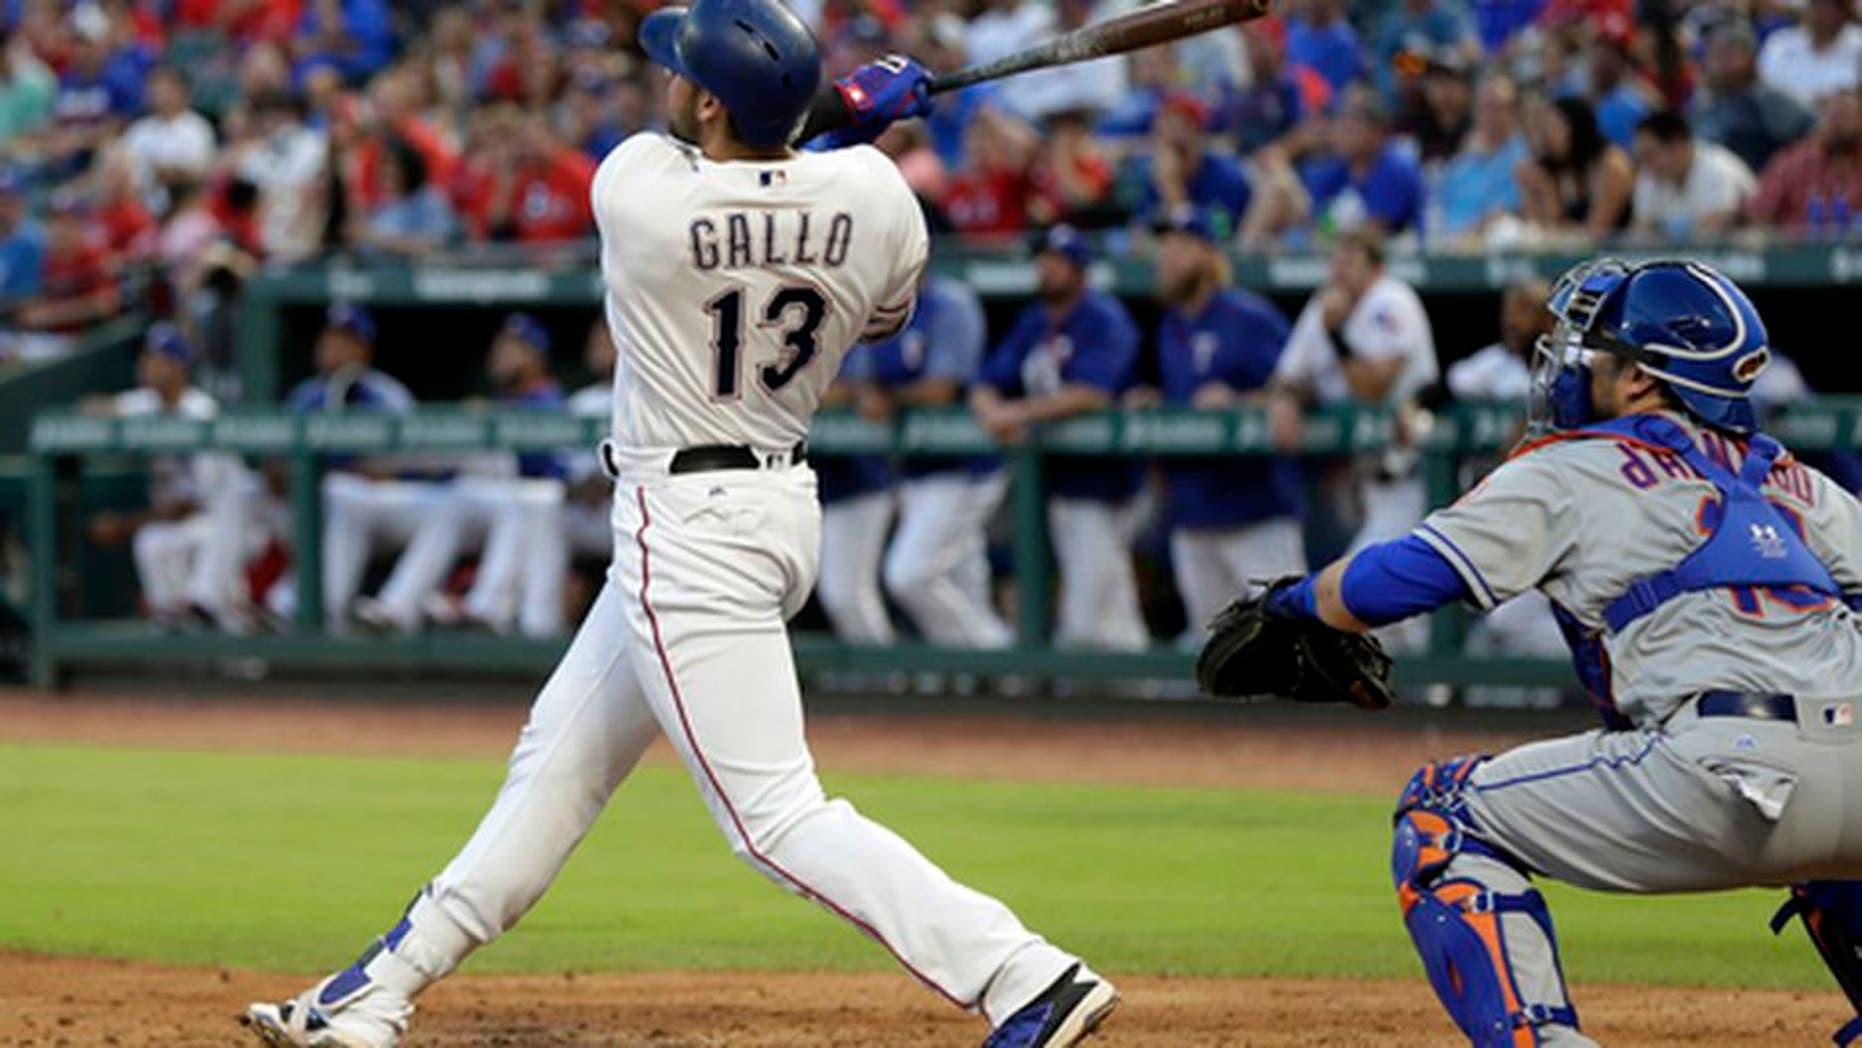 Texas Rangers' Joey Gallo (13) follows through on a two-run home run swing as New York Mets catcher Travis d'Arnaud watches in the third inning of an interleague baseball game, Tuesday, June 6, 2017, in Arlington, Texas. The shot scored Adrian Beltre in the 10-8 Rangers win. (AP Photo/Tony Gutierrez)